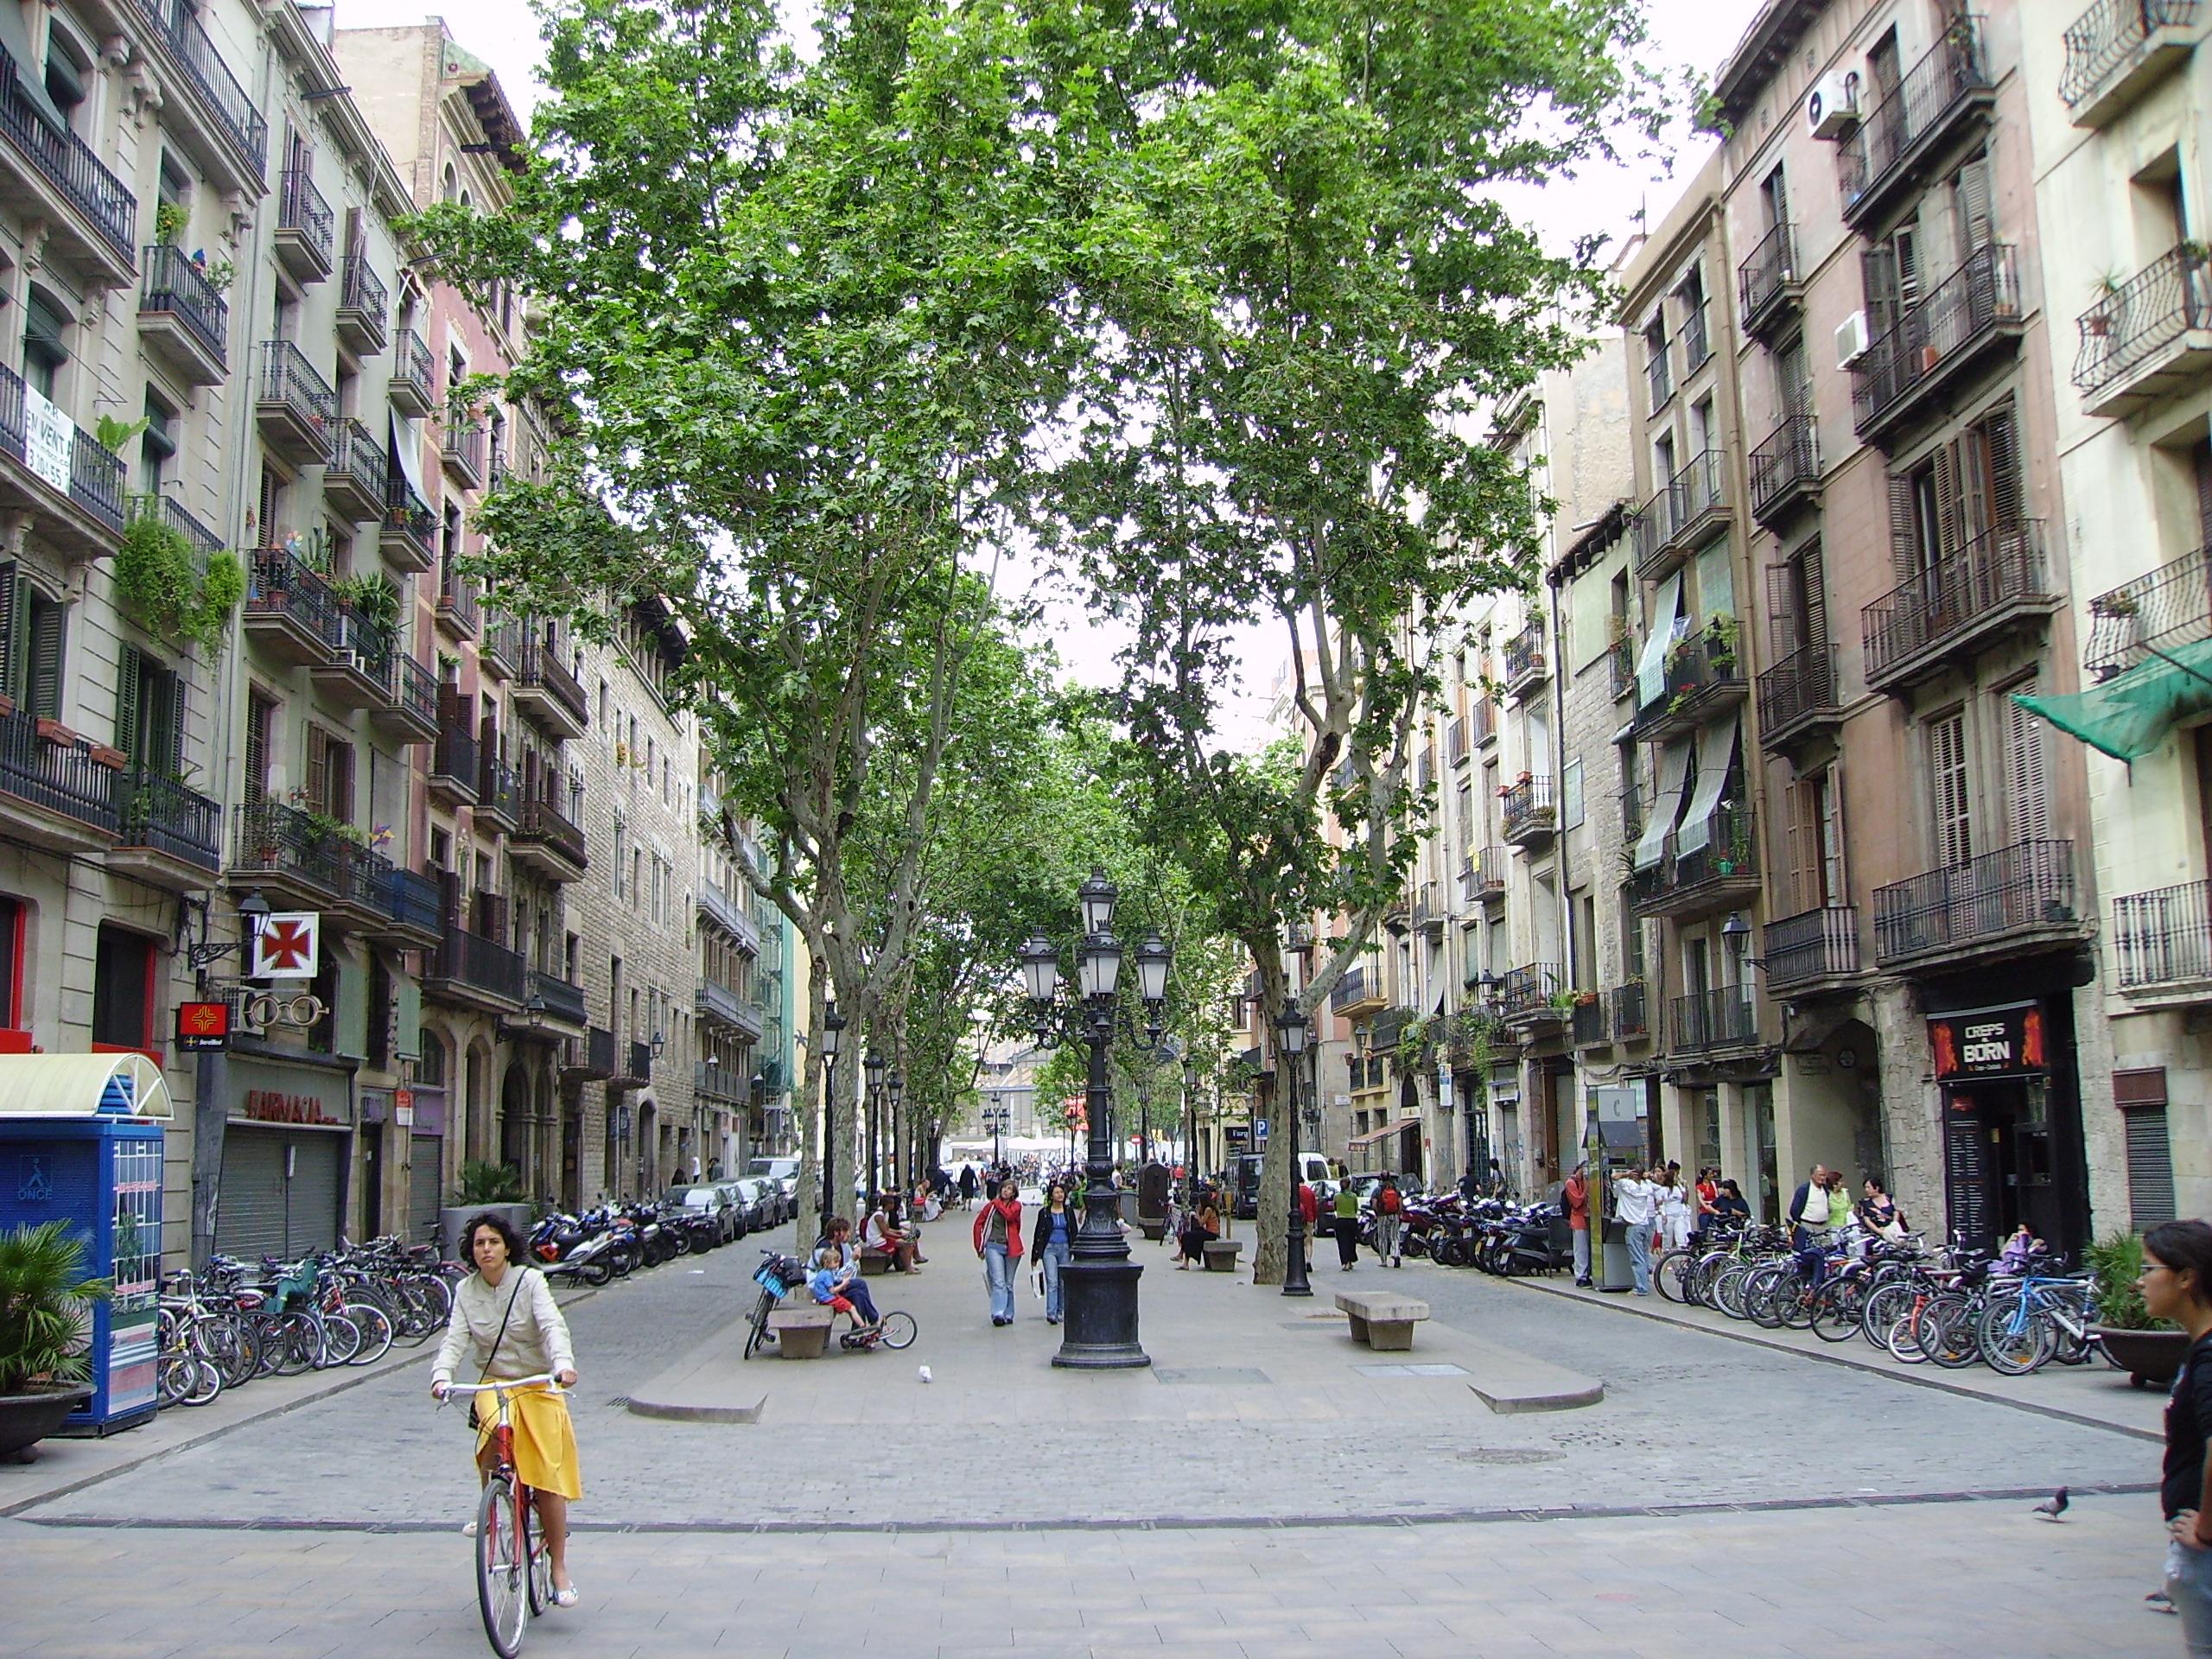 Fitxer passeig del born barcelona catalonia jpg for Hoteles en el born de barcelona